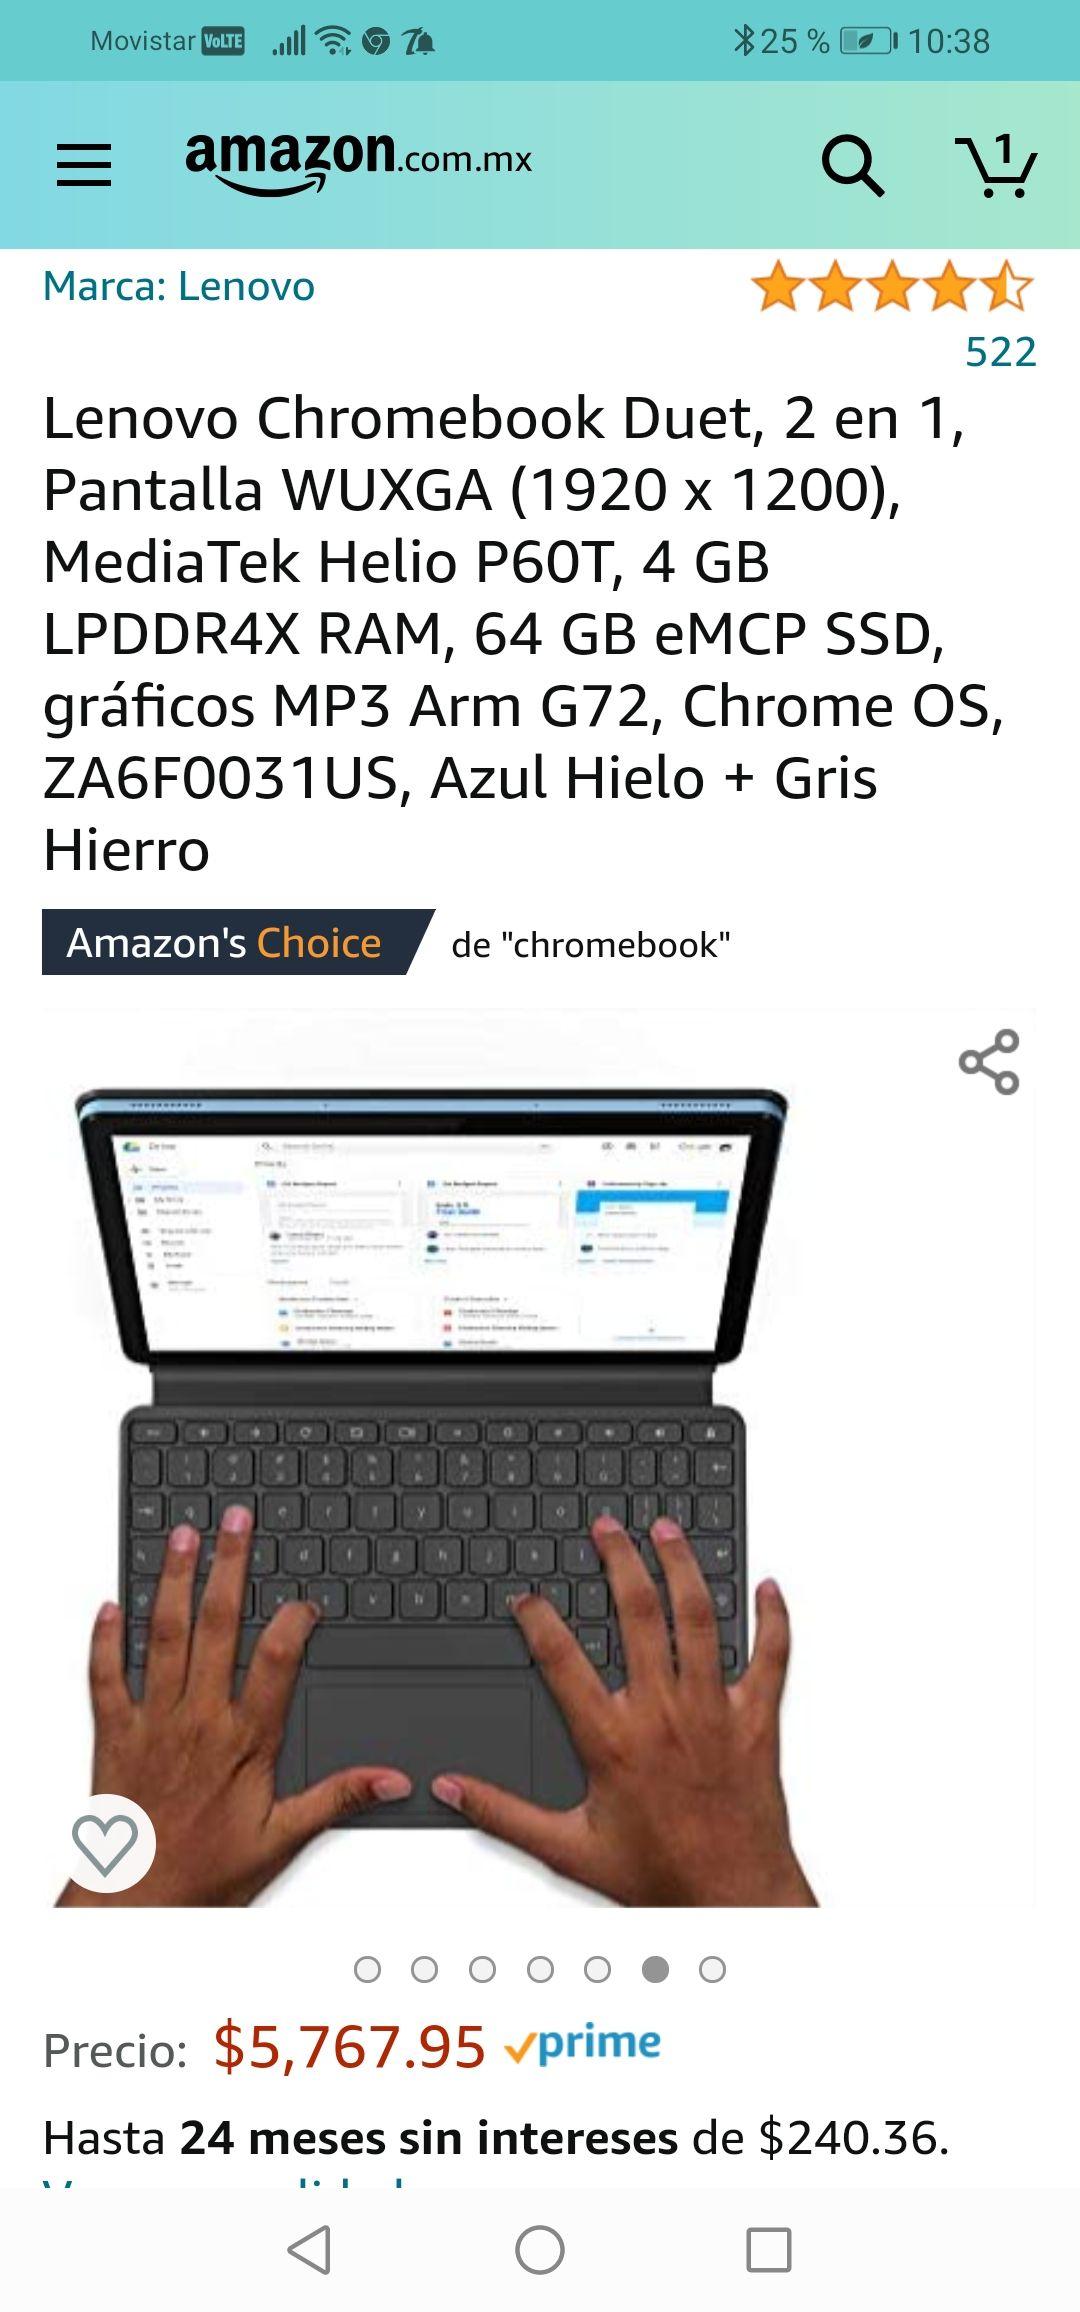 Amazon: Lenovo Chromebook Duet, 2 en 1, Pantalla WUXGA (1920 x 1200), MediaTek Helio P60T, 4 GB LPDDR4X RAM, 64 GB eMCP SSD, gráficos MP3